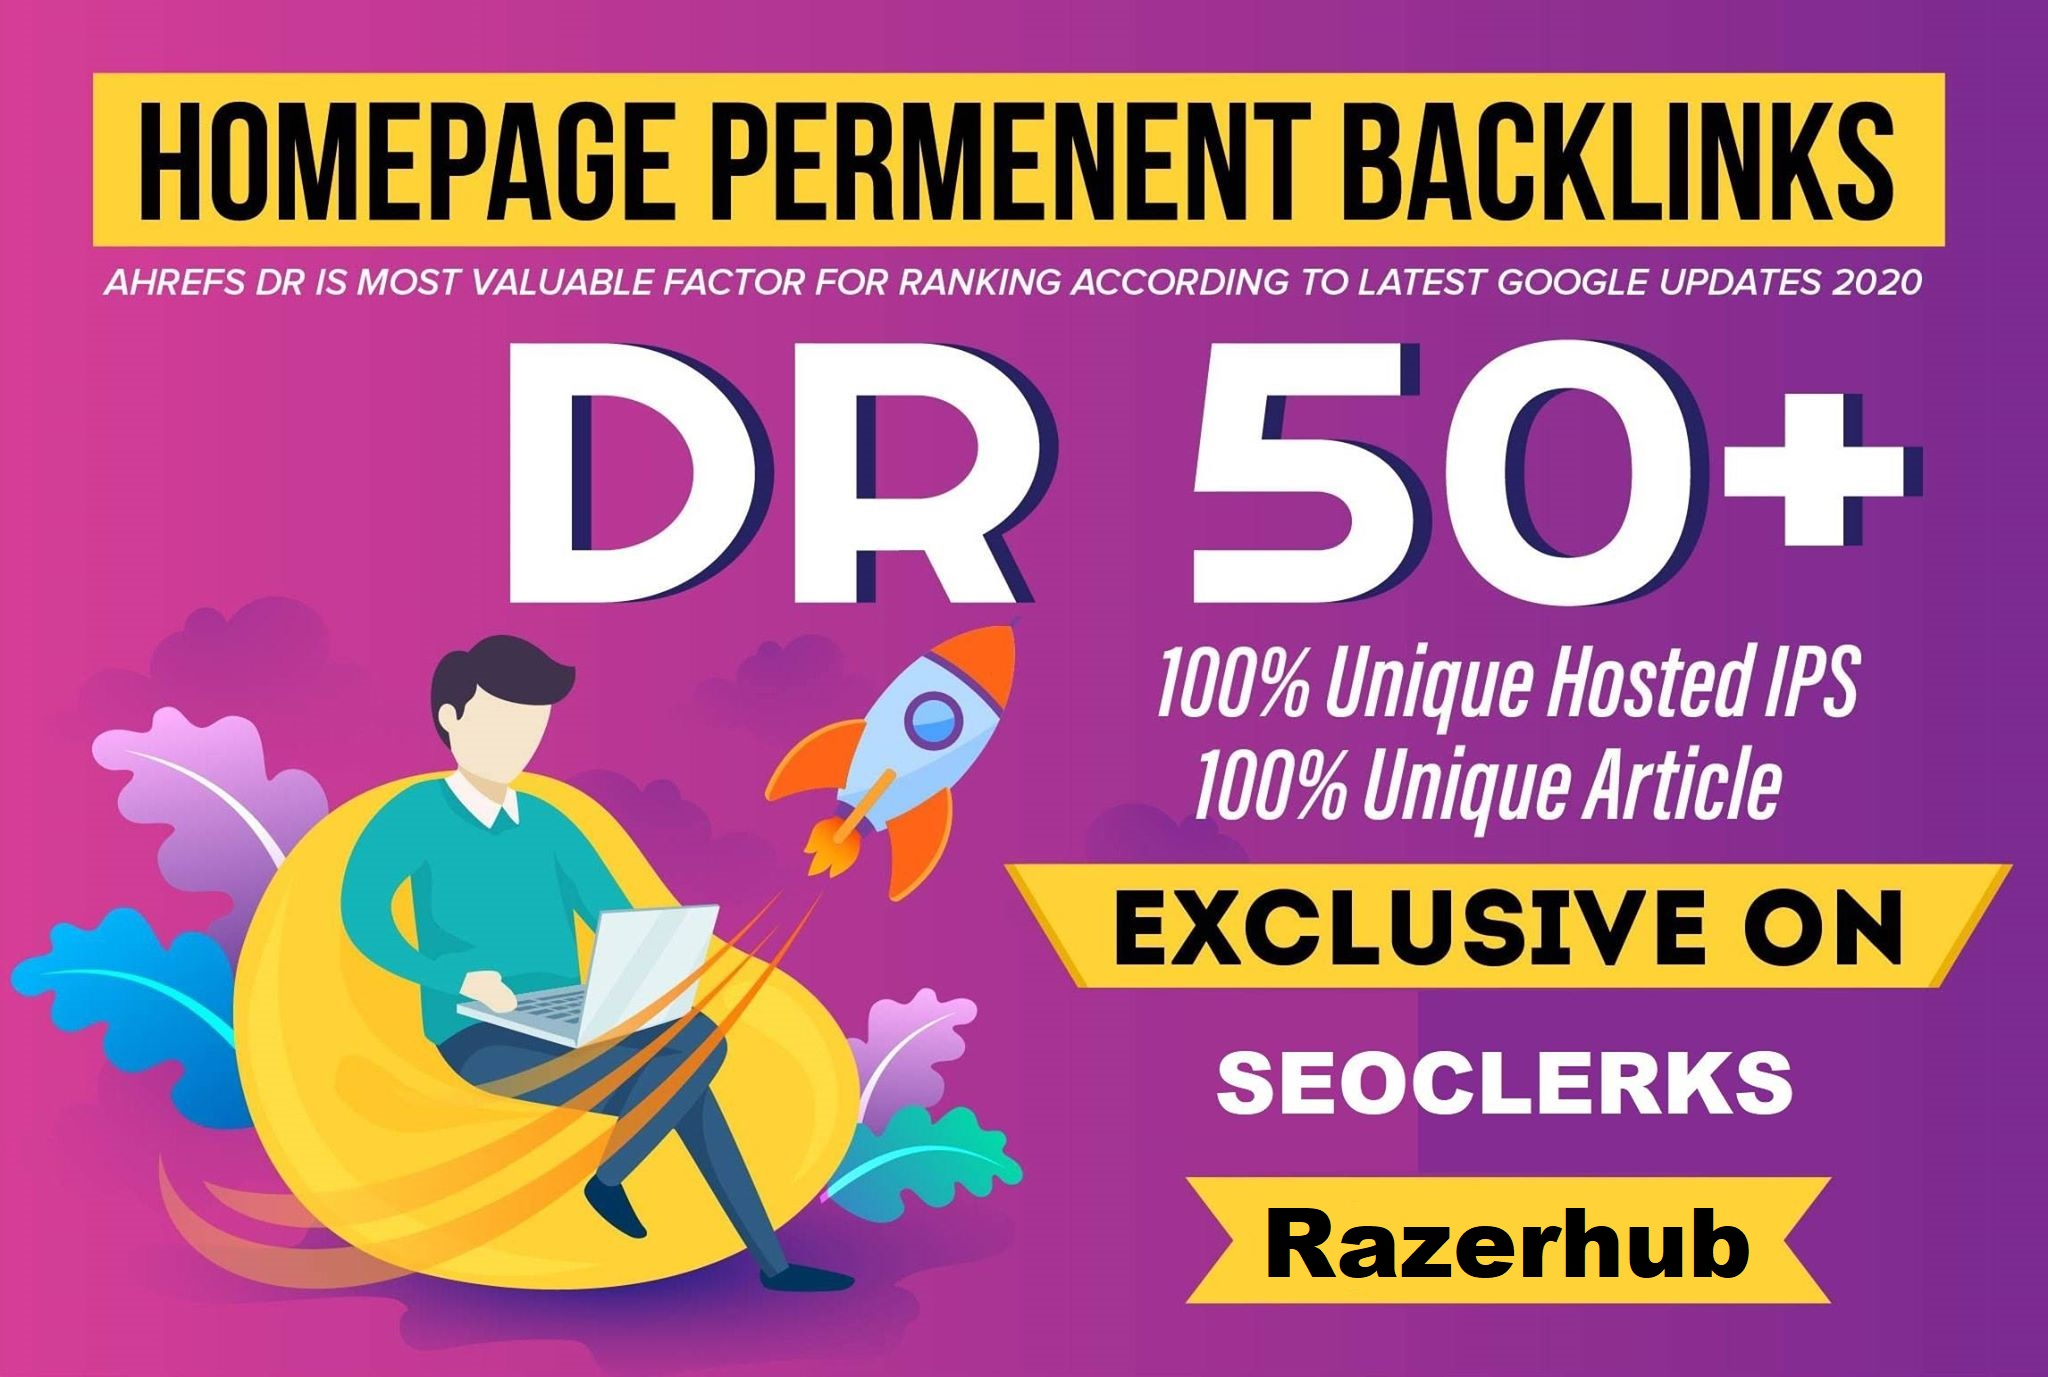 build 14 Manual dr50 plus homepage pbn dofollow Unique backlinks